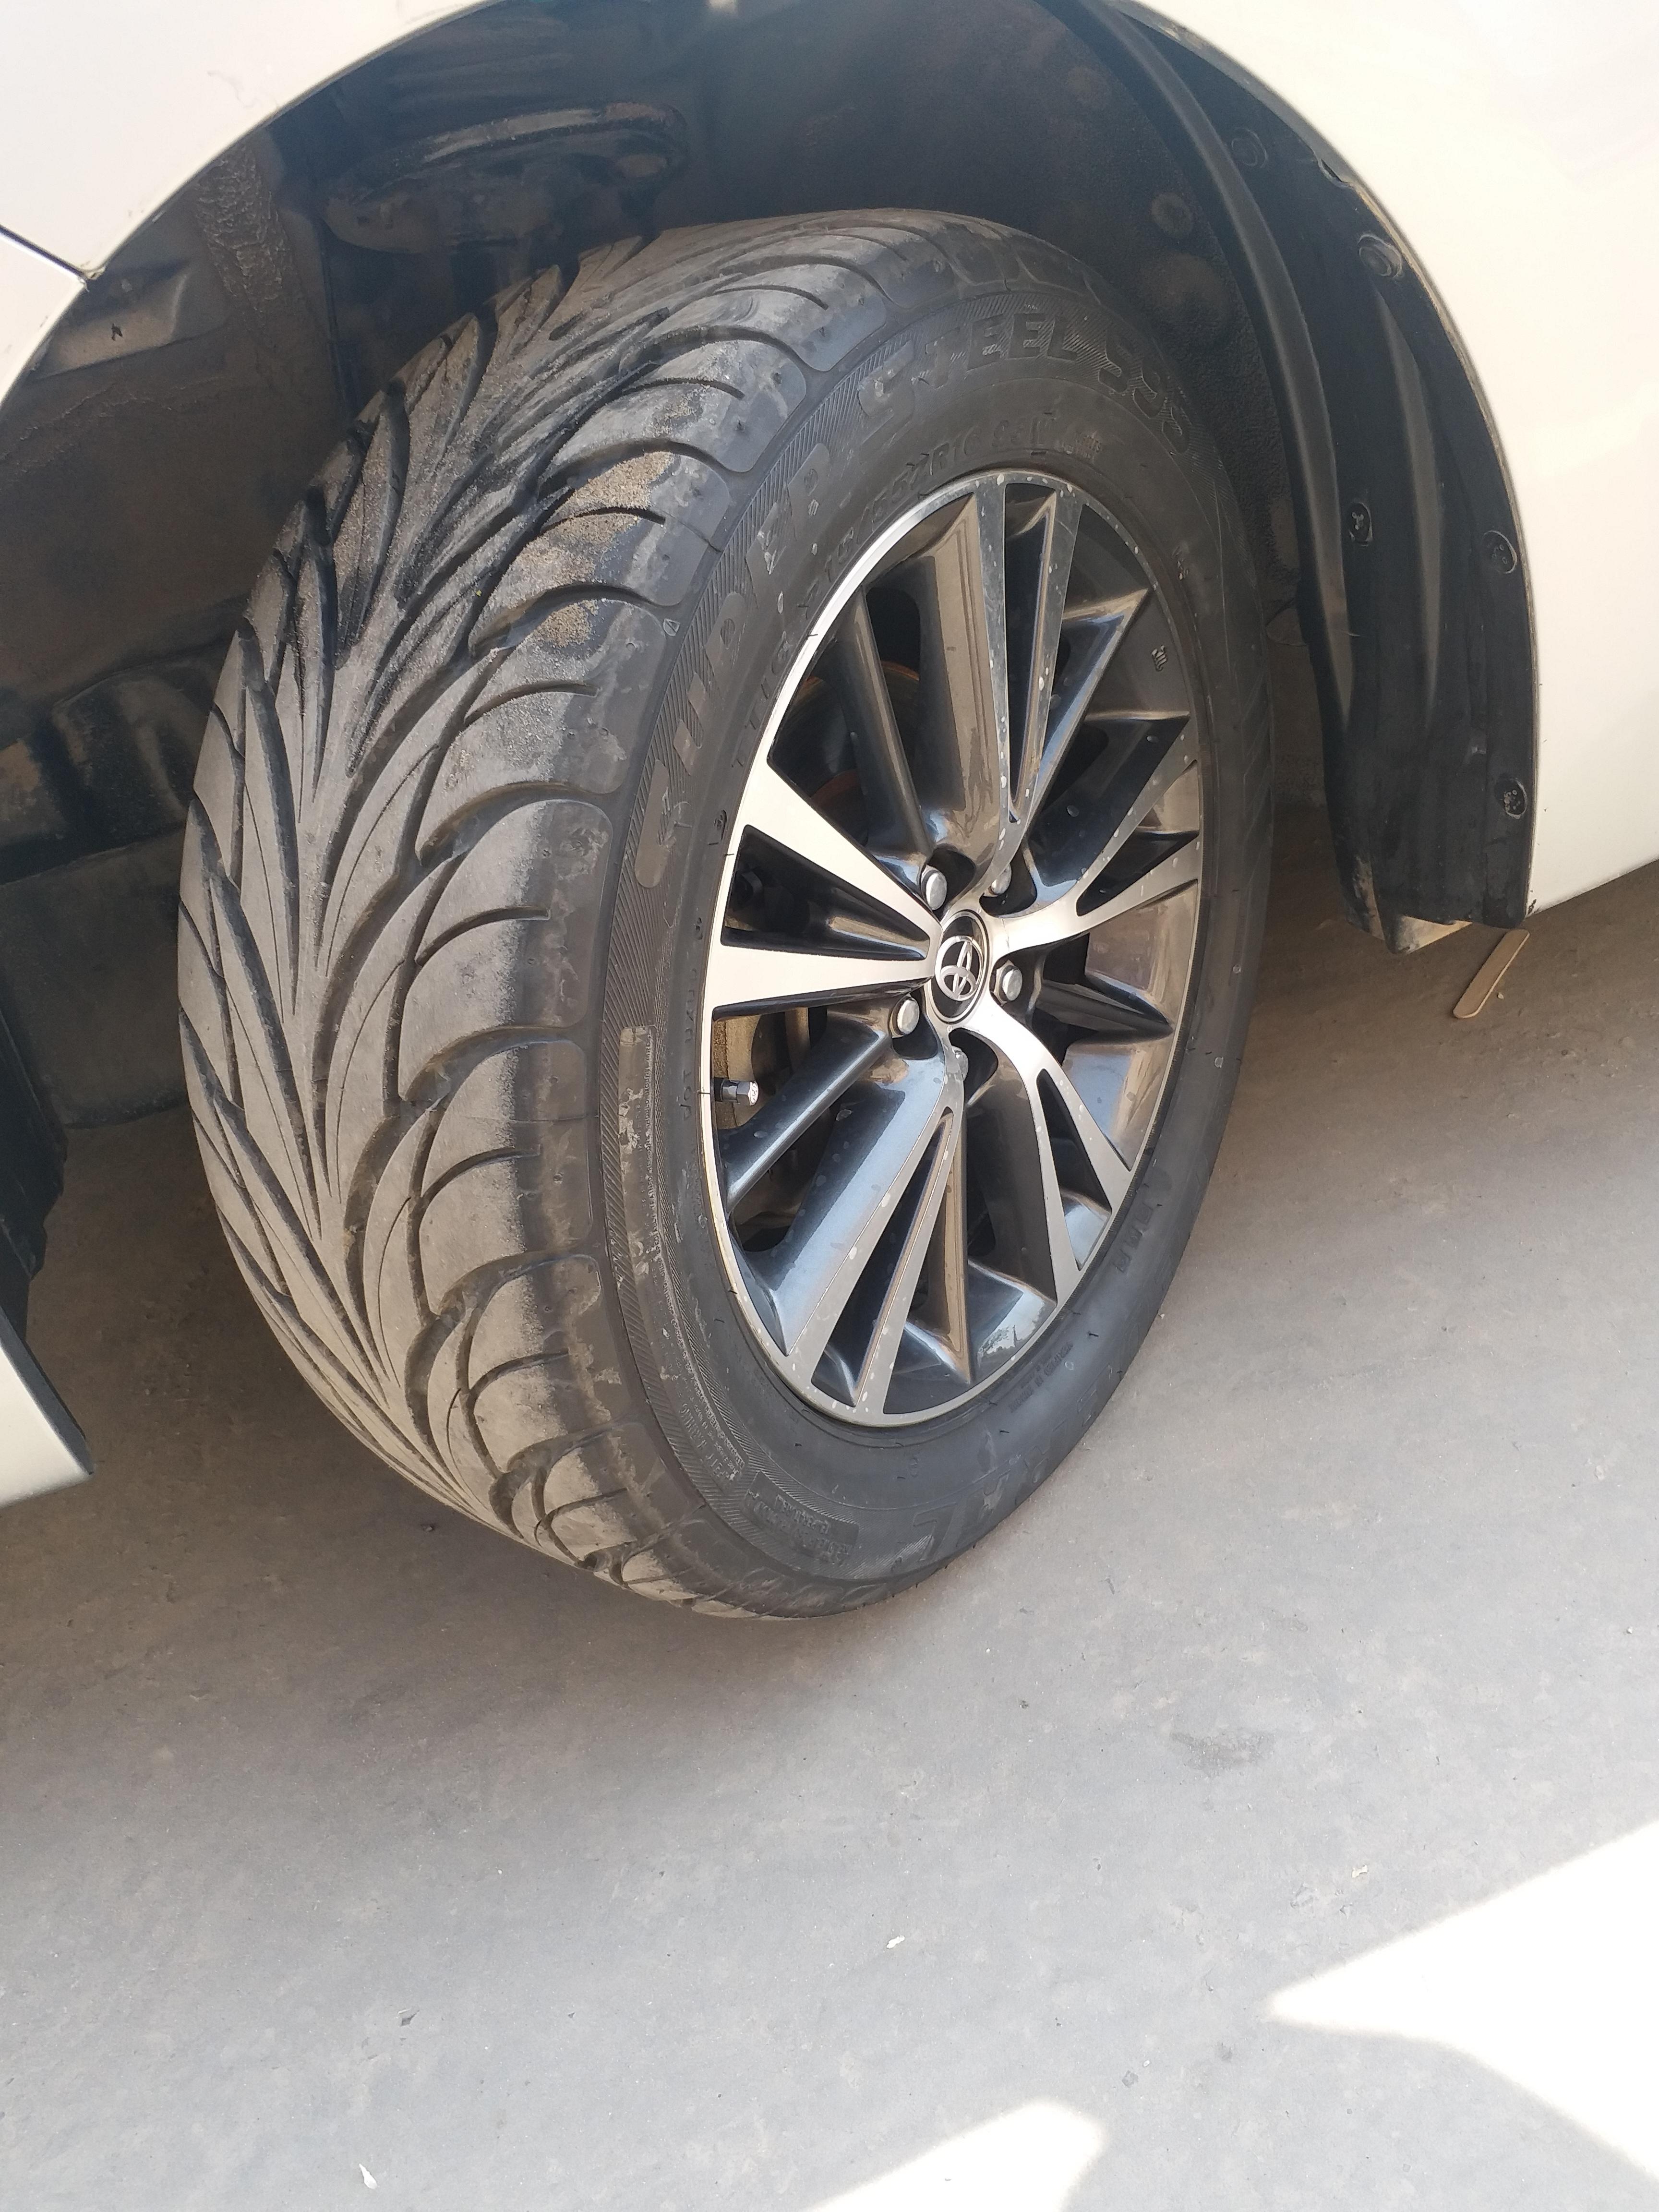 Installed 2018 Genuine Grande Rims In 2015 Model Toyota Corolla